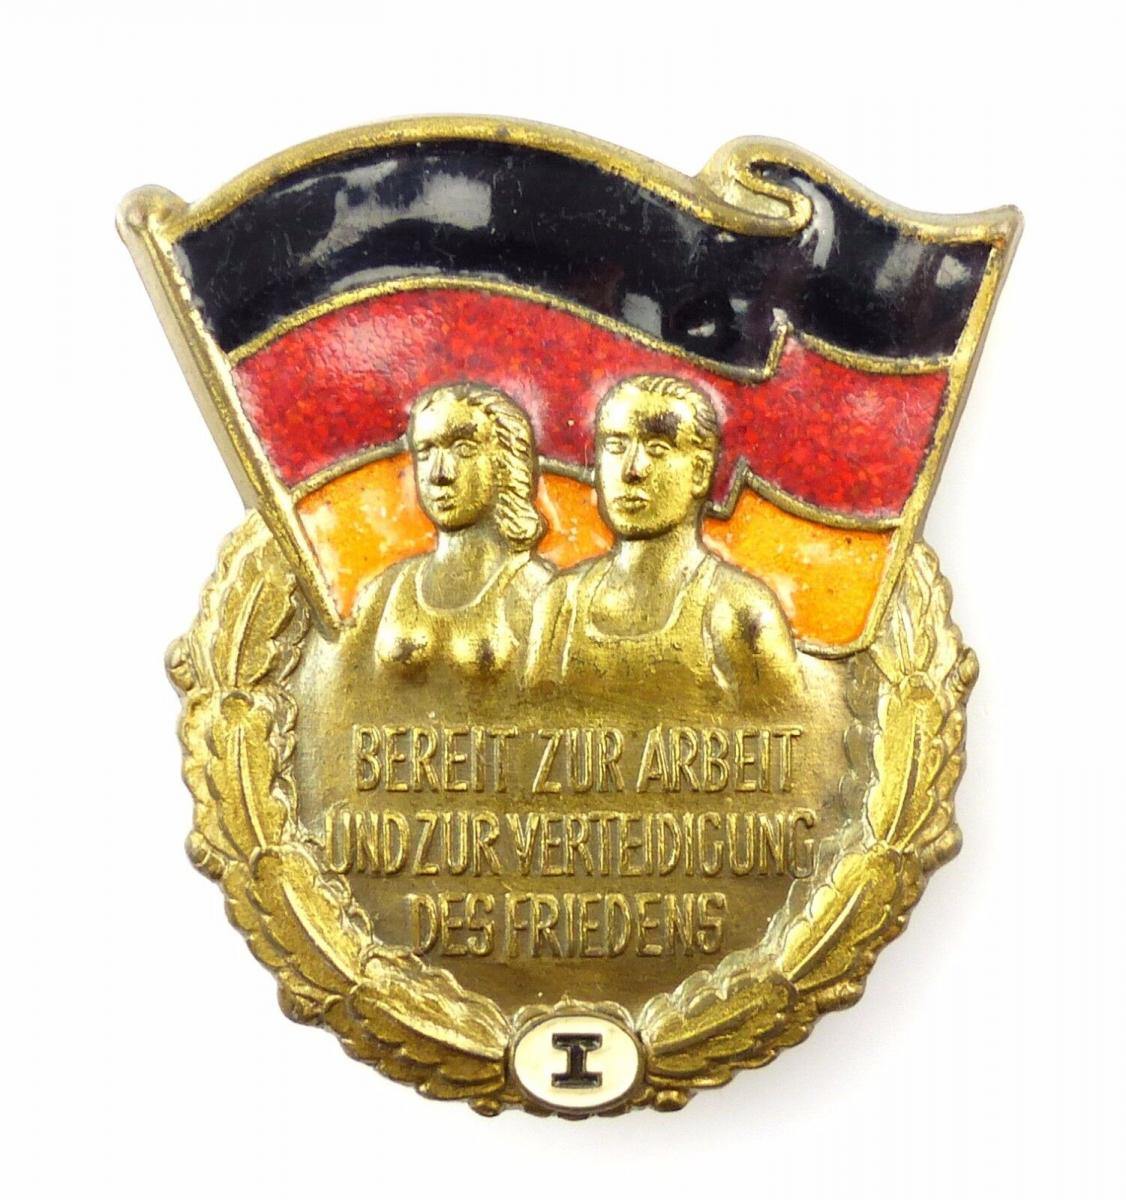 #e5360 Sportabzeichen für Erwachsene vgl. Band VI Nr. 1923 d Stufe I 1951